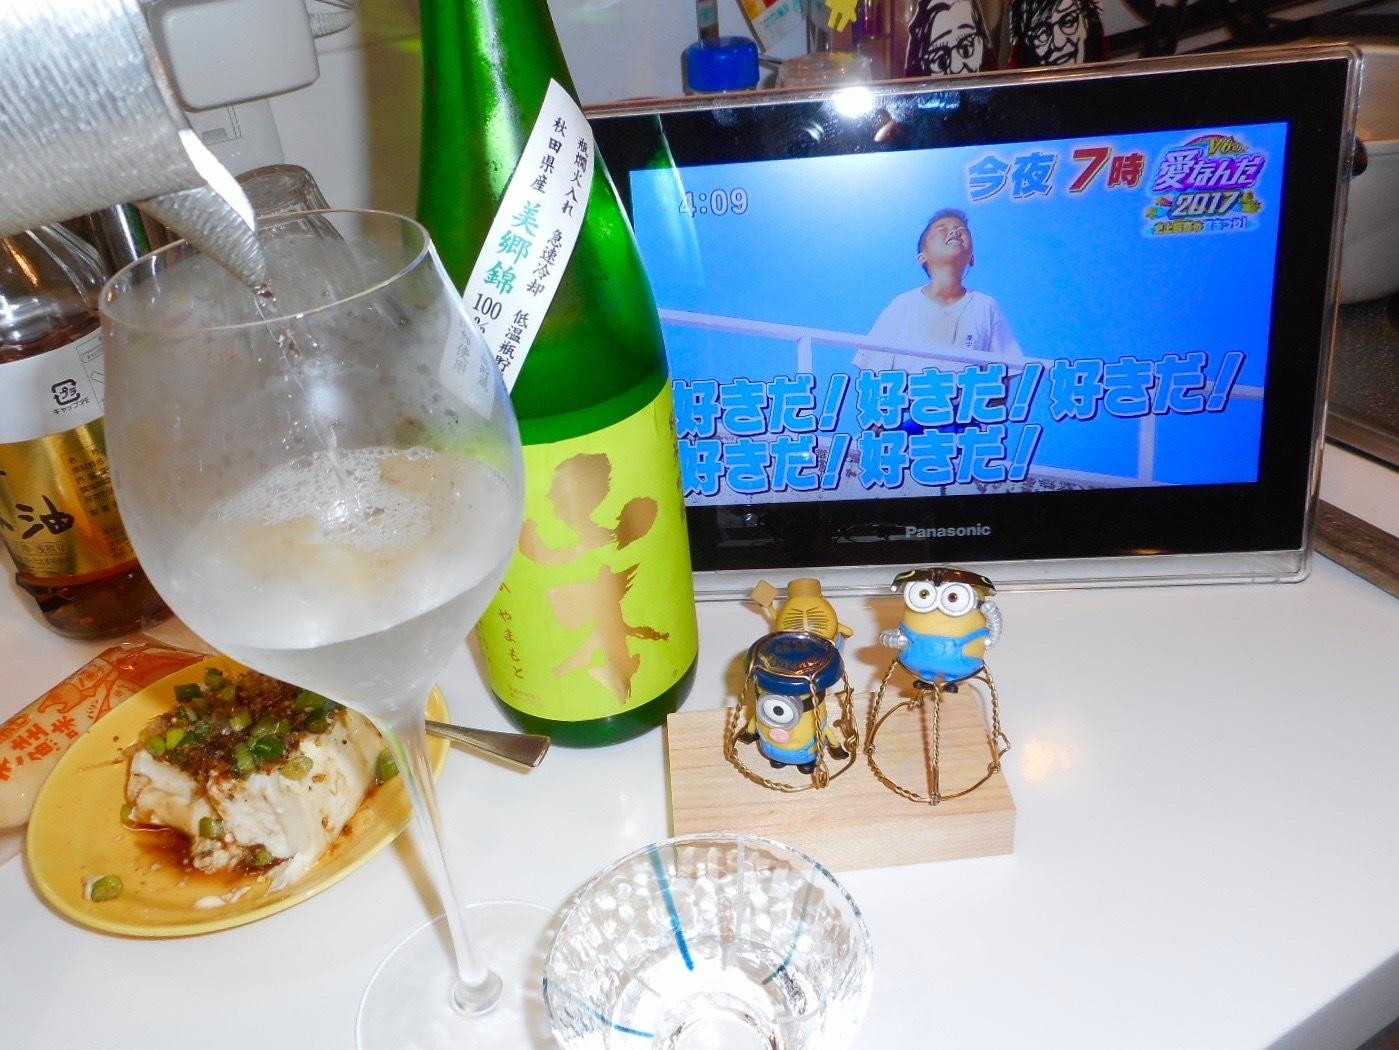 yamamoto_misatonishiki55_28by6.jpg